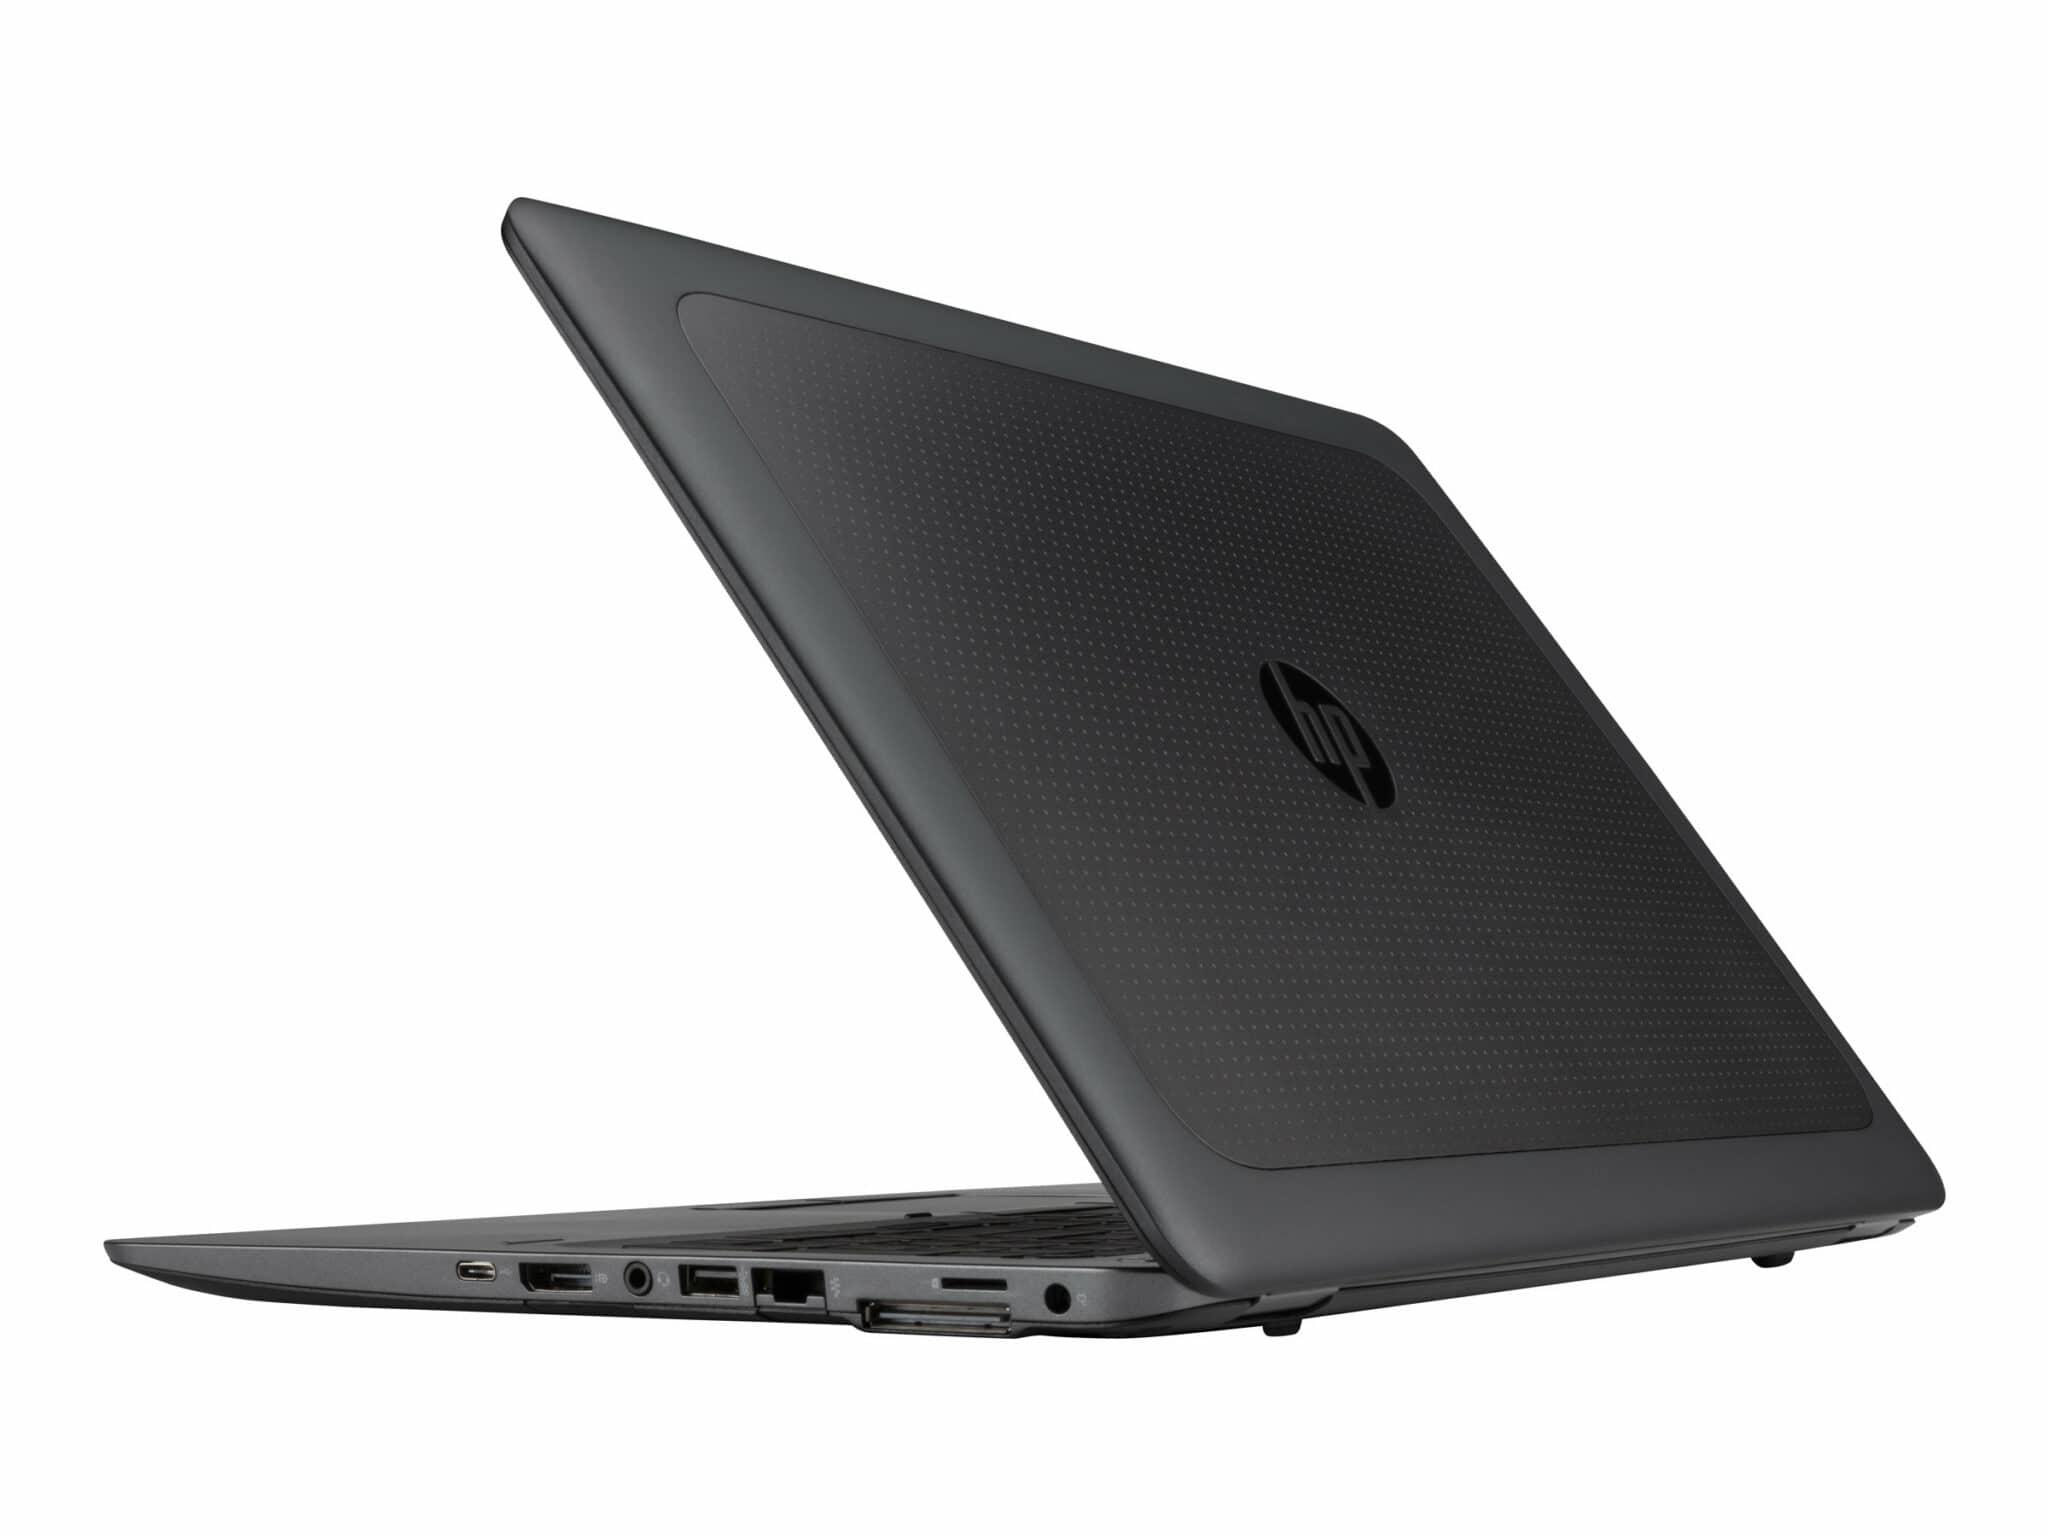 Hp Promo 15u I5 6200u 156 8gb 256 Pc Us Rack Simply Laptop Product Details Notebook